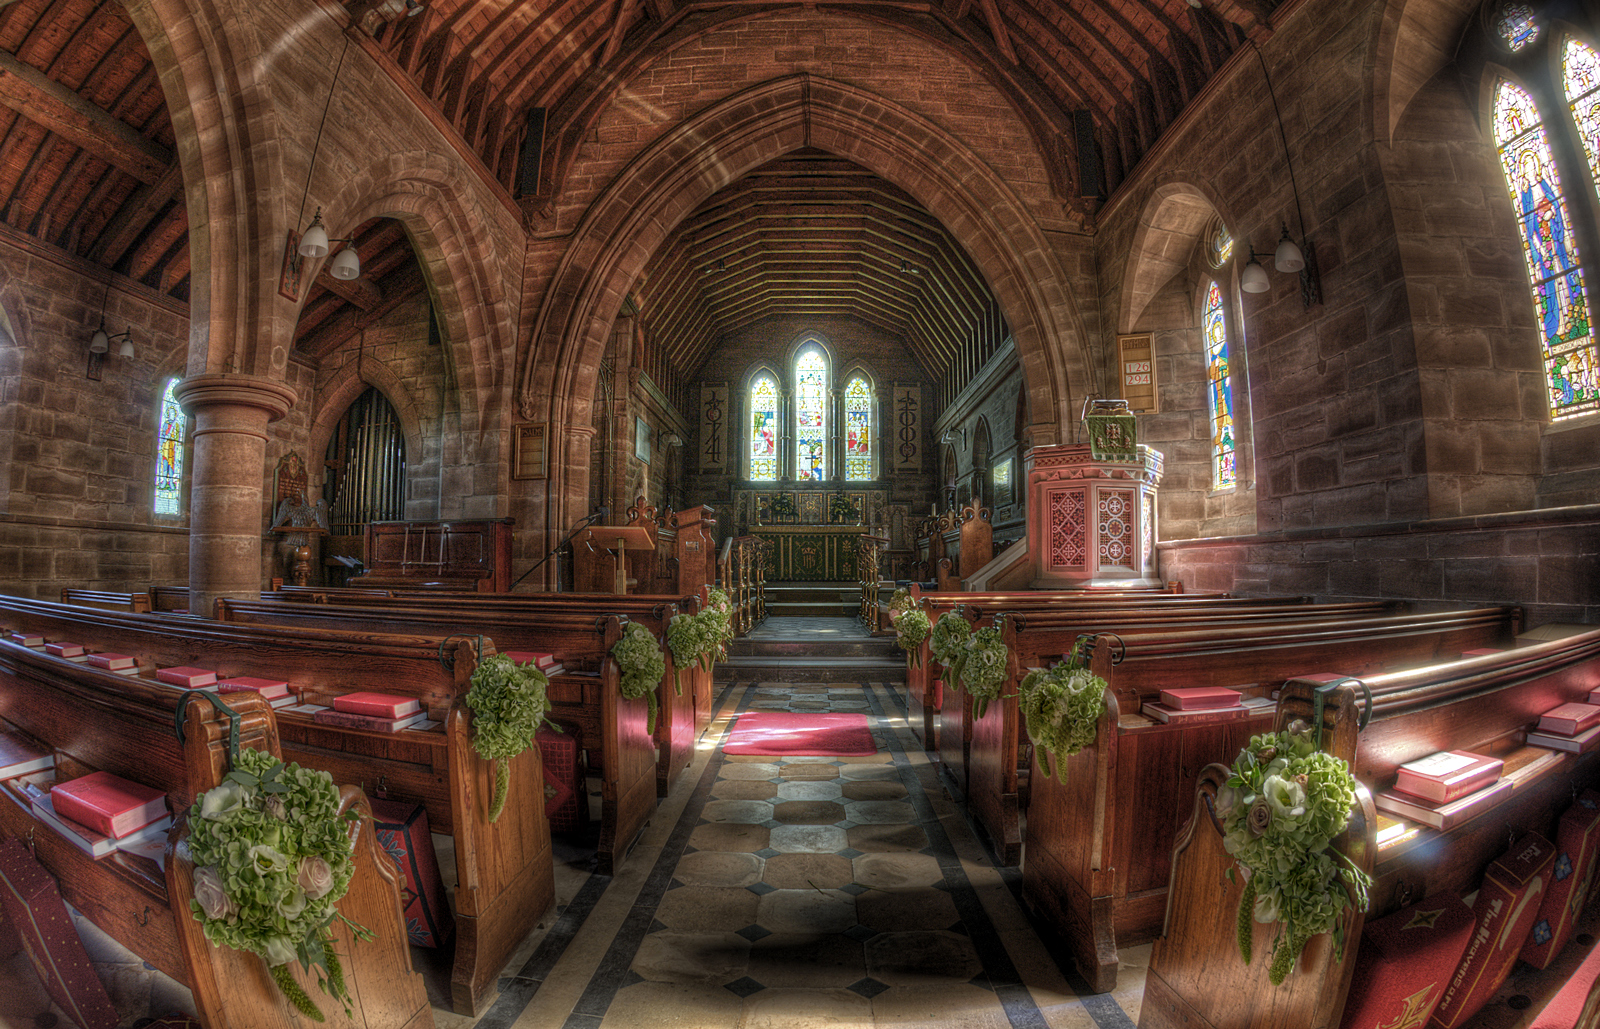 Aisle to Altar